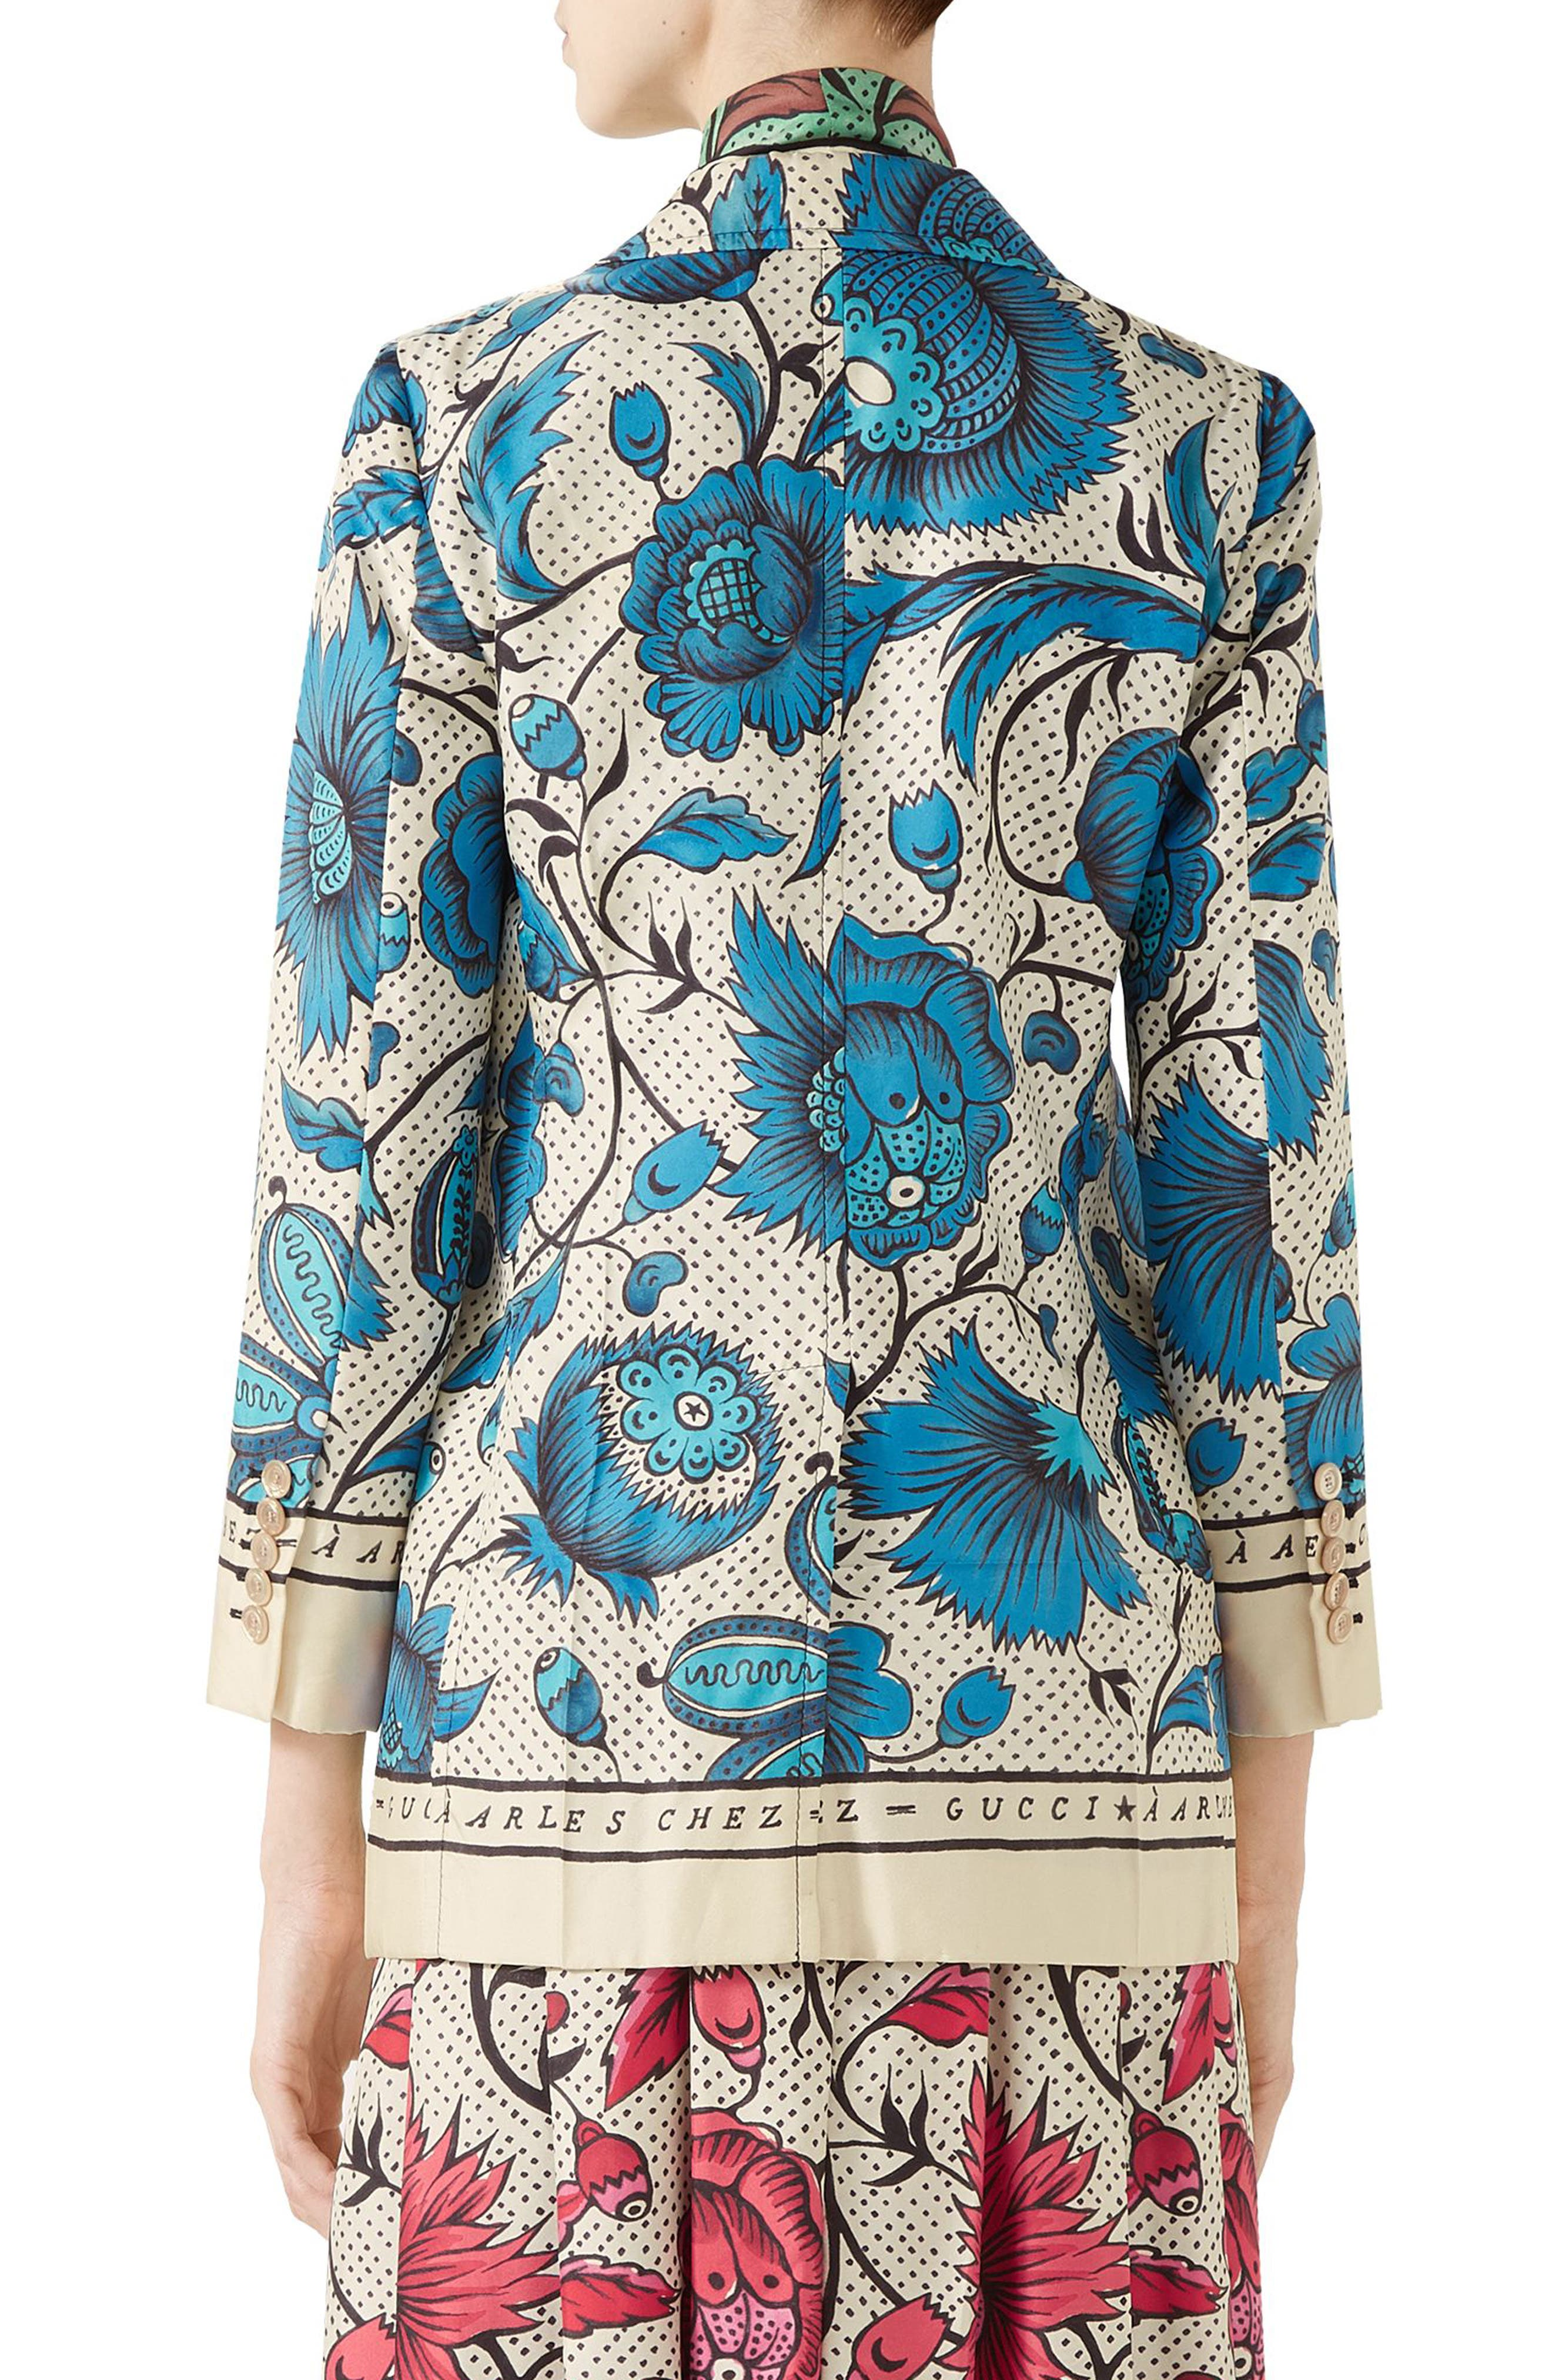 Watercolor Floral Print Silk Jacket,                             Alternate thumbnail 2, color,                             4821 BLUE/ IVORY PRT/ MC